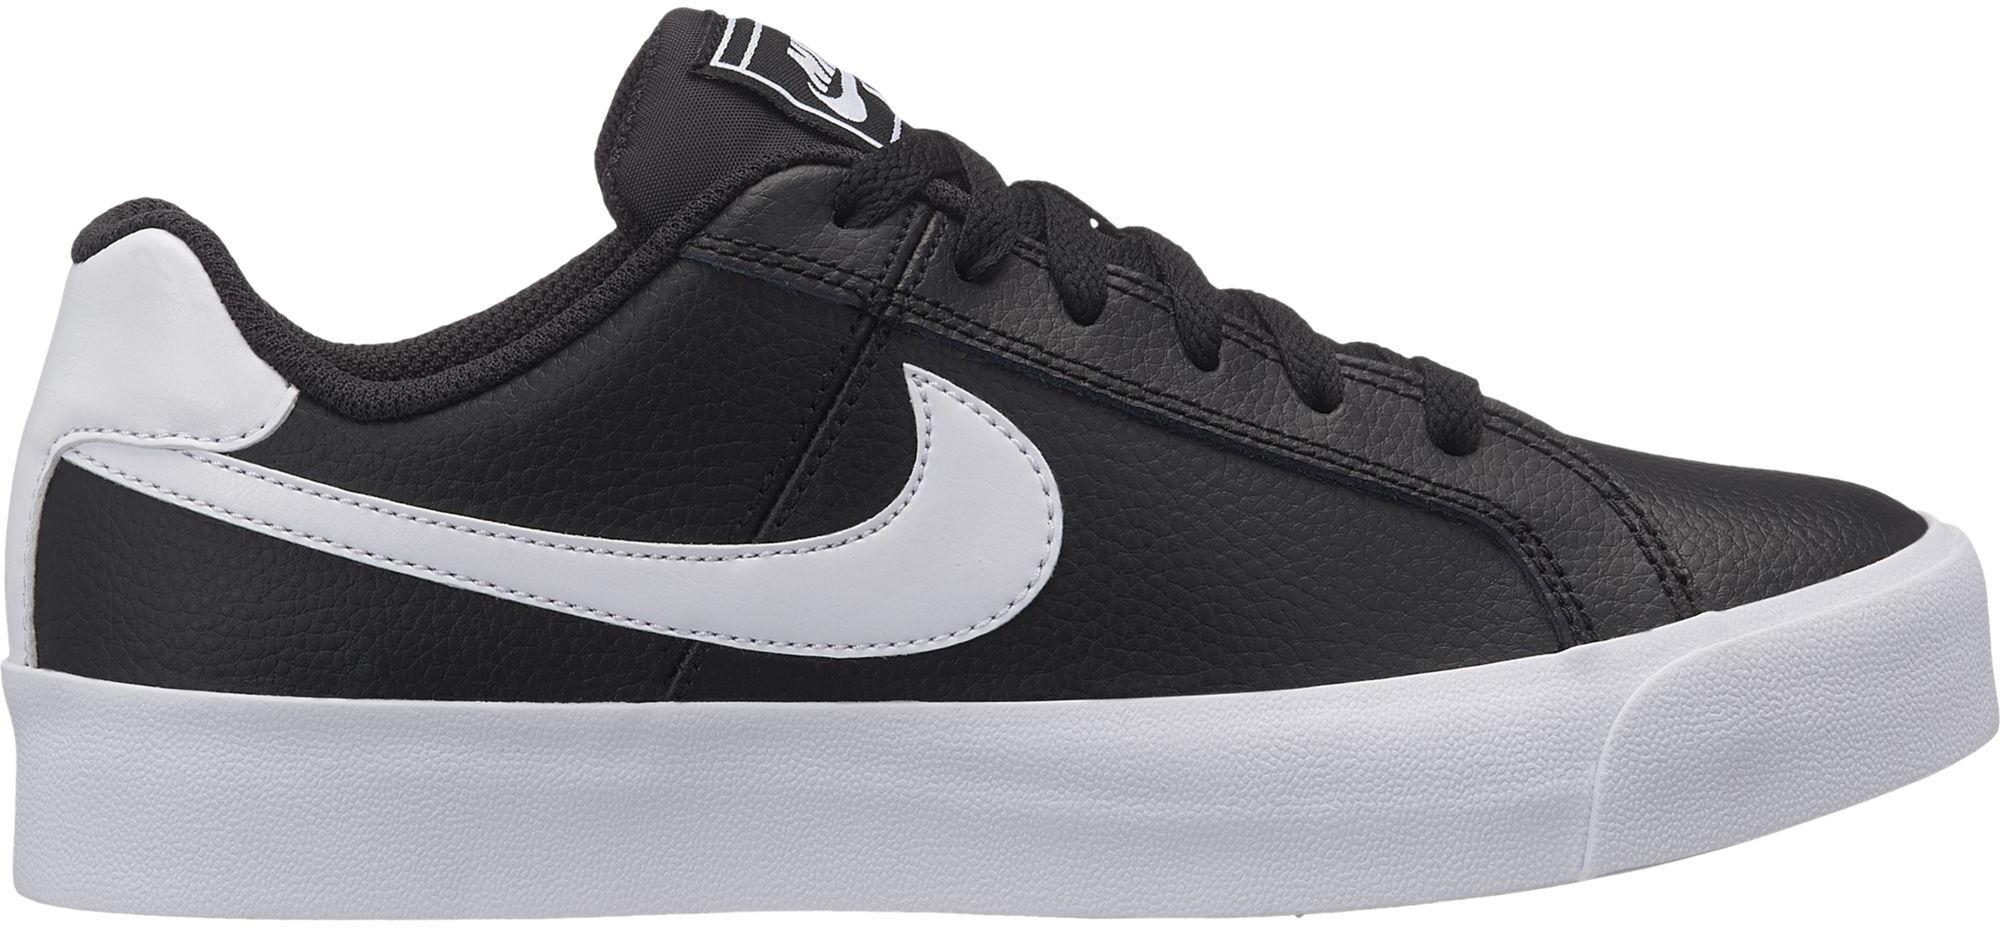 Nike Sneakers Dames Ac Zwart Court Royale Zxw6pqYZr